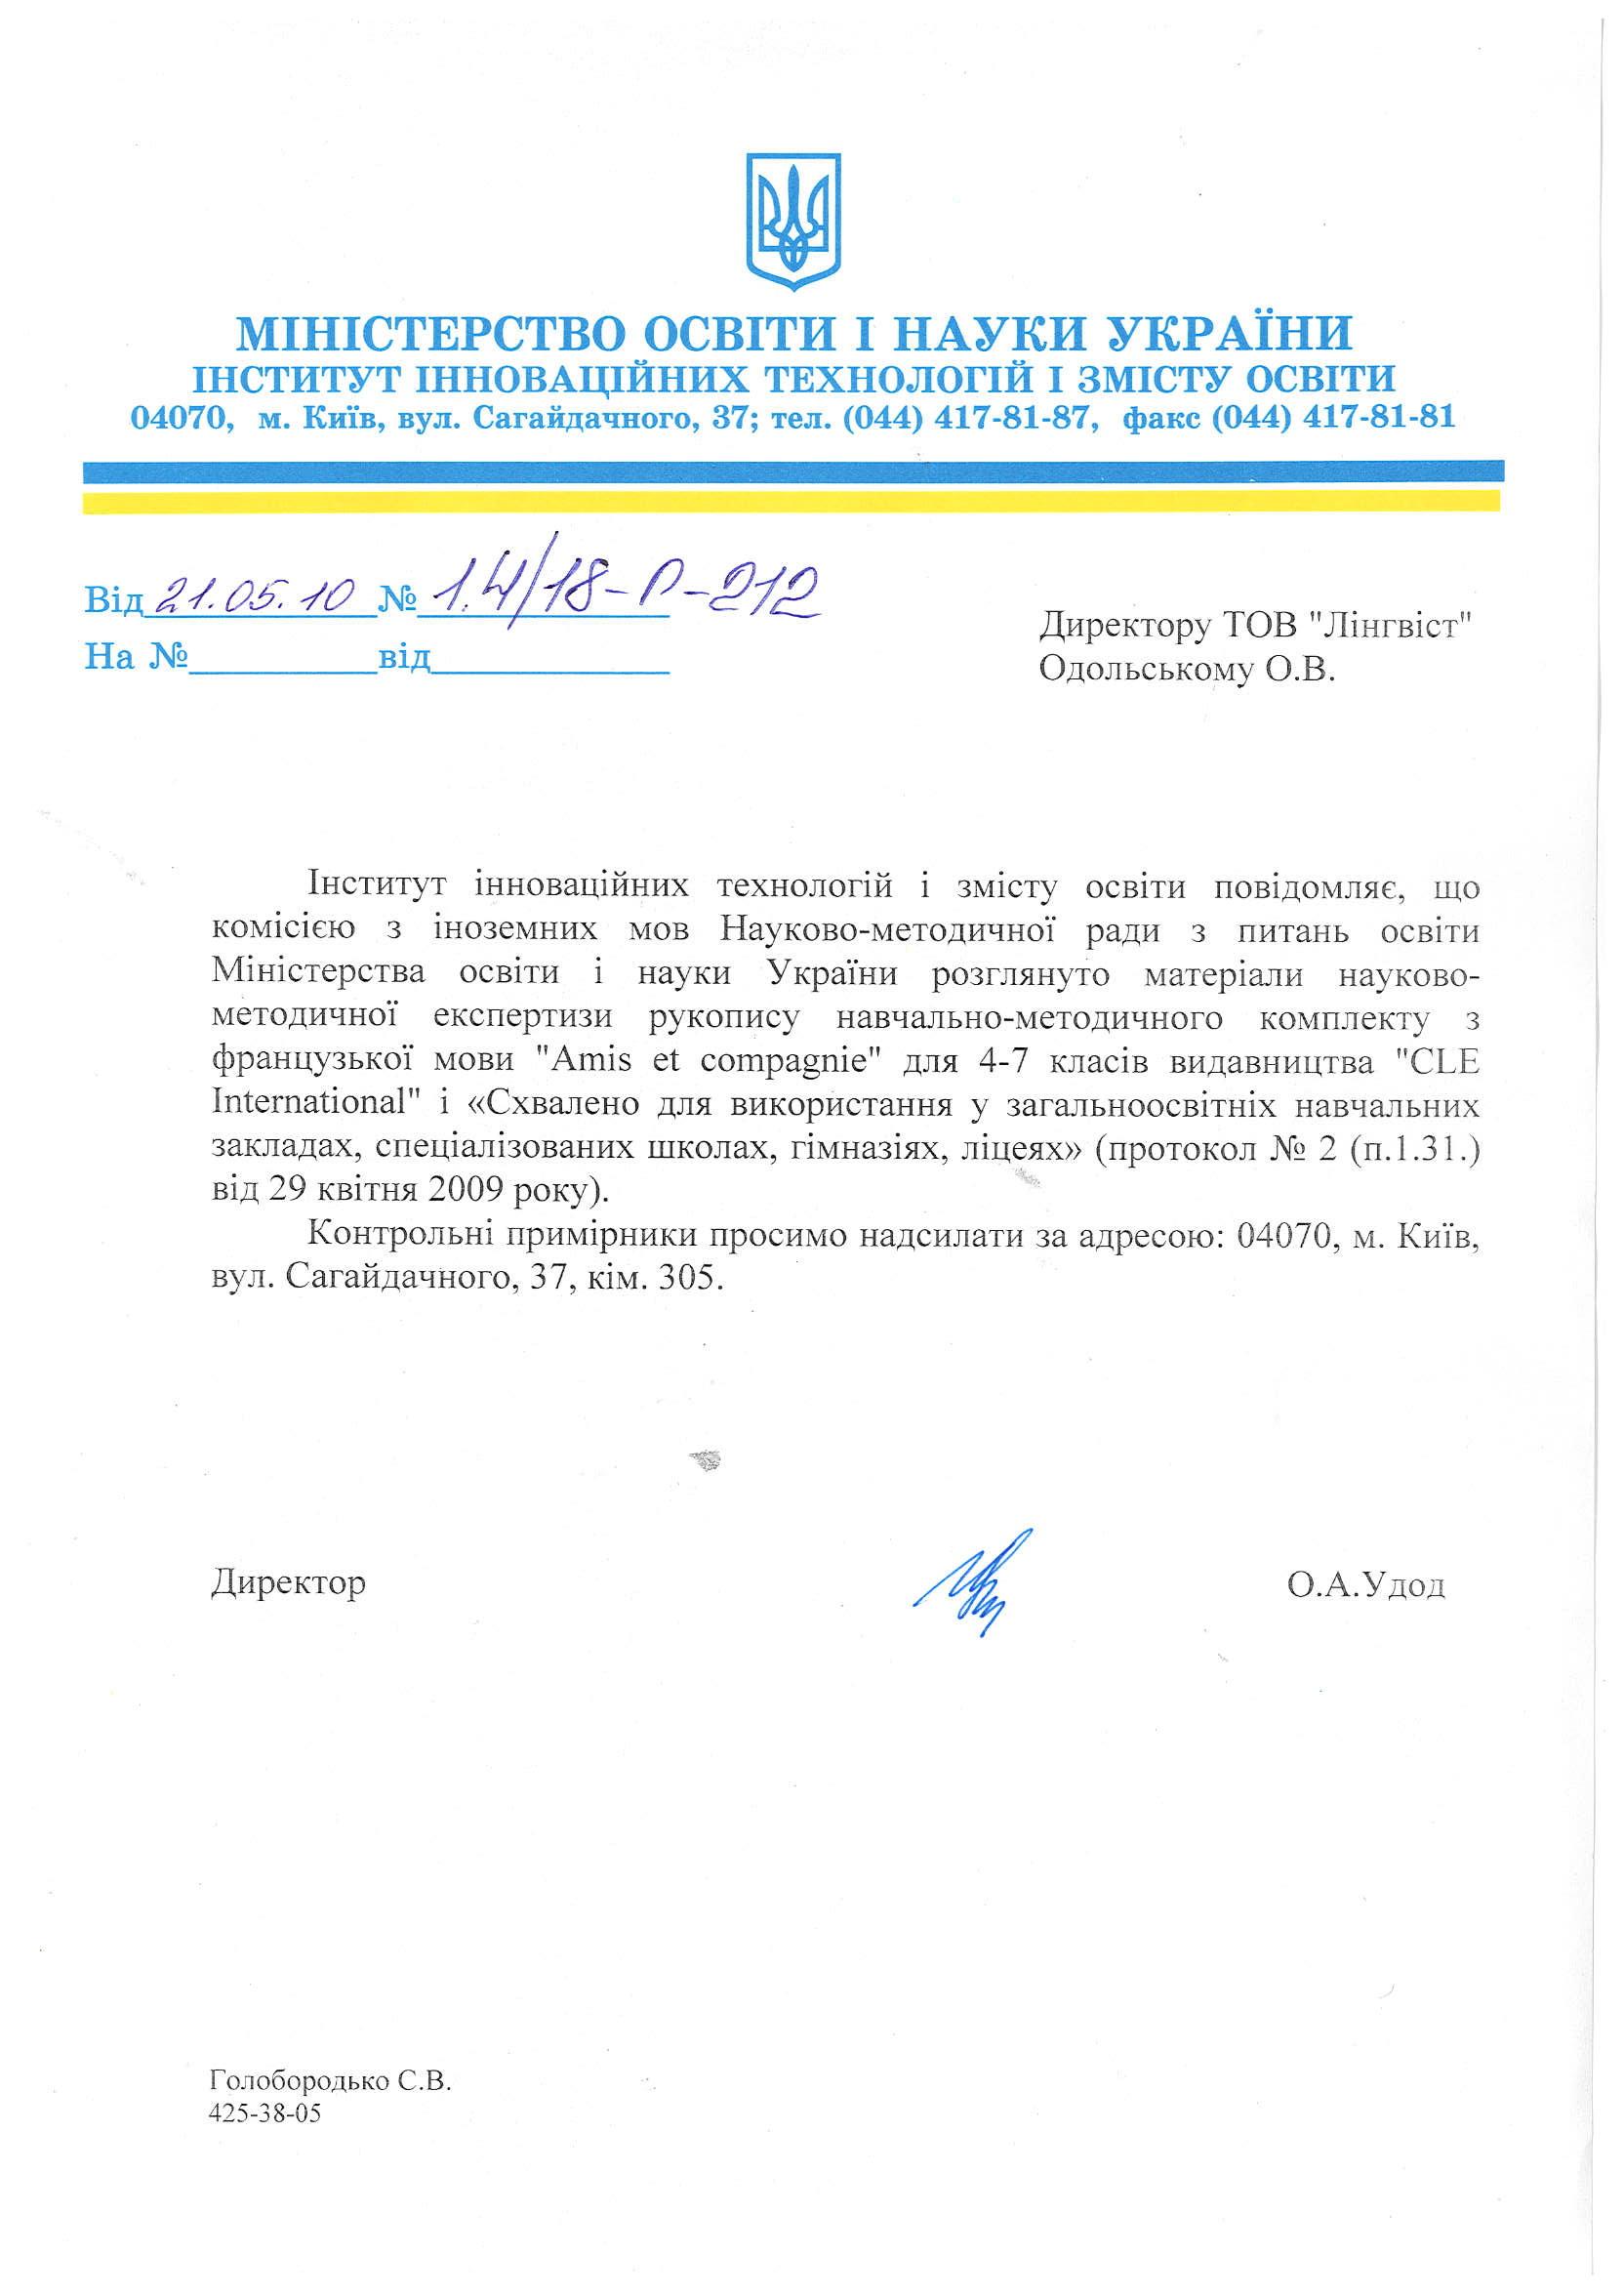 amis et compagnie 1 pdf скачать бесплатно